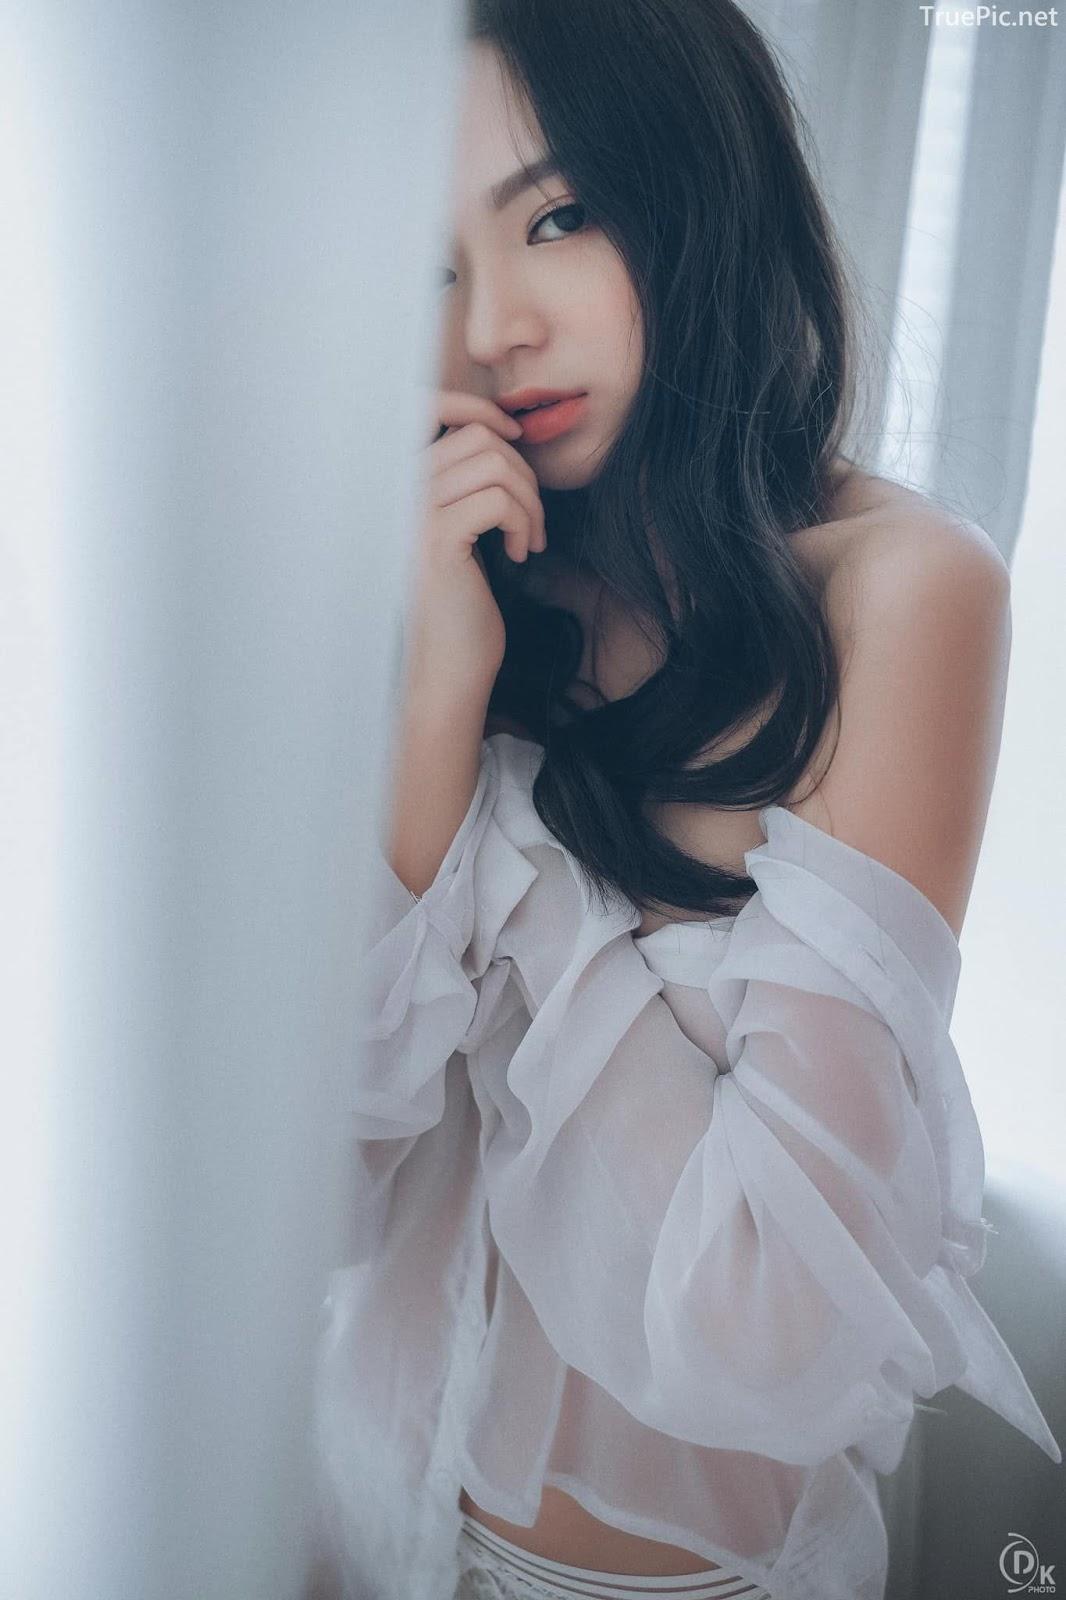 Vietnamese Sexy Model - Vu Ngoc Kim Chi - Beautiful in white - TruePic.net- Picture 14